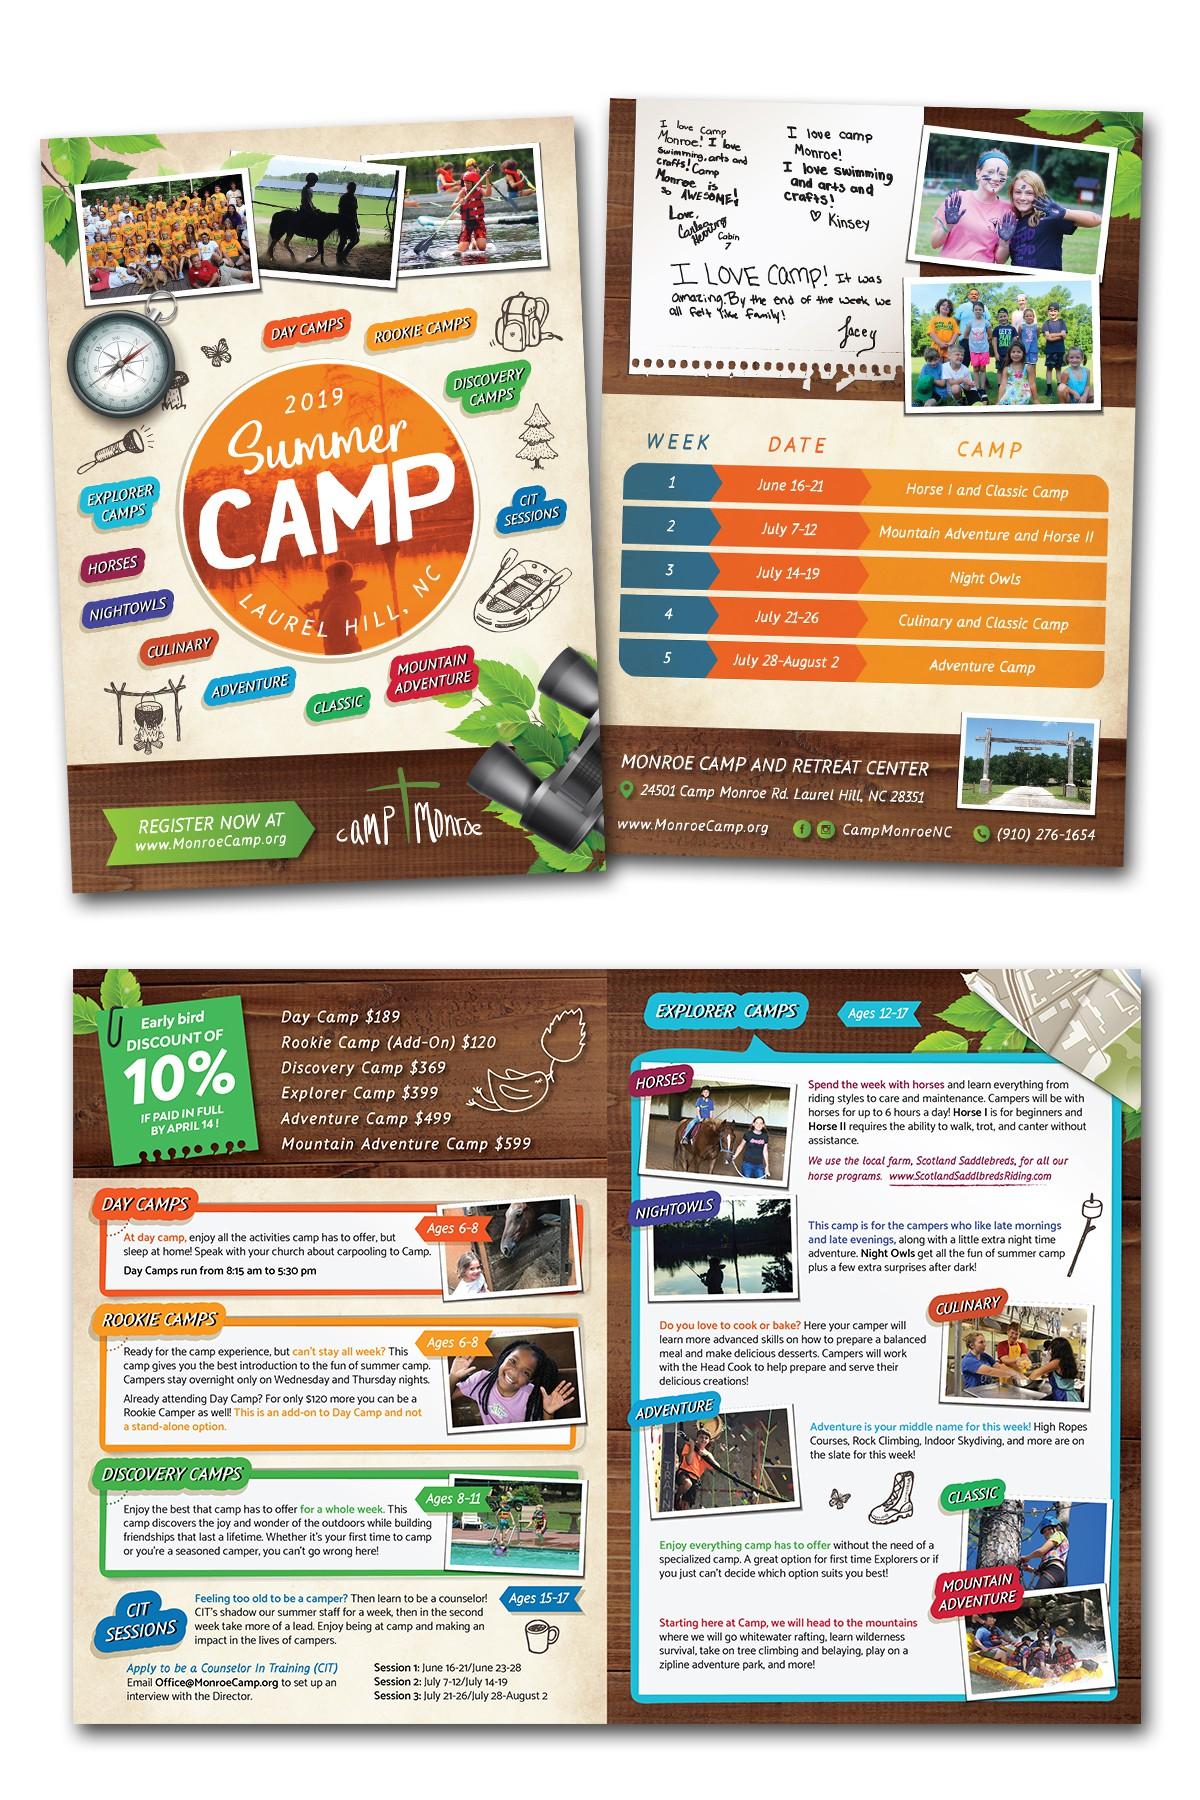 Camp Monroe brochure